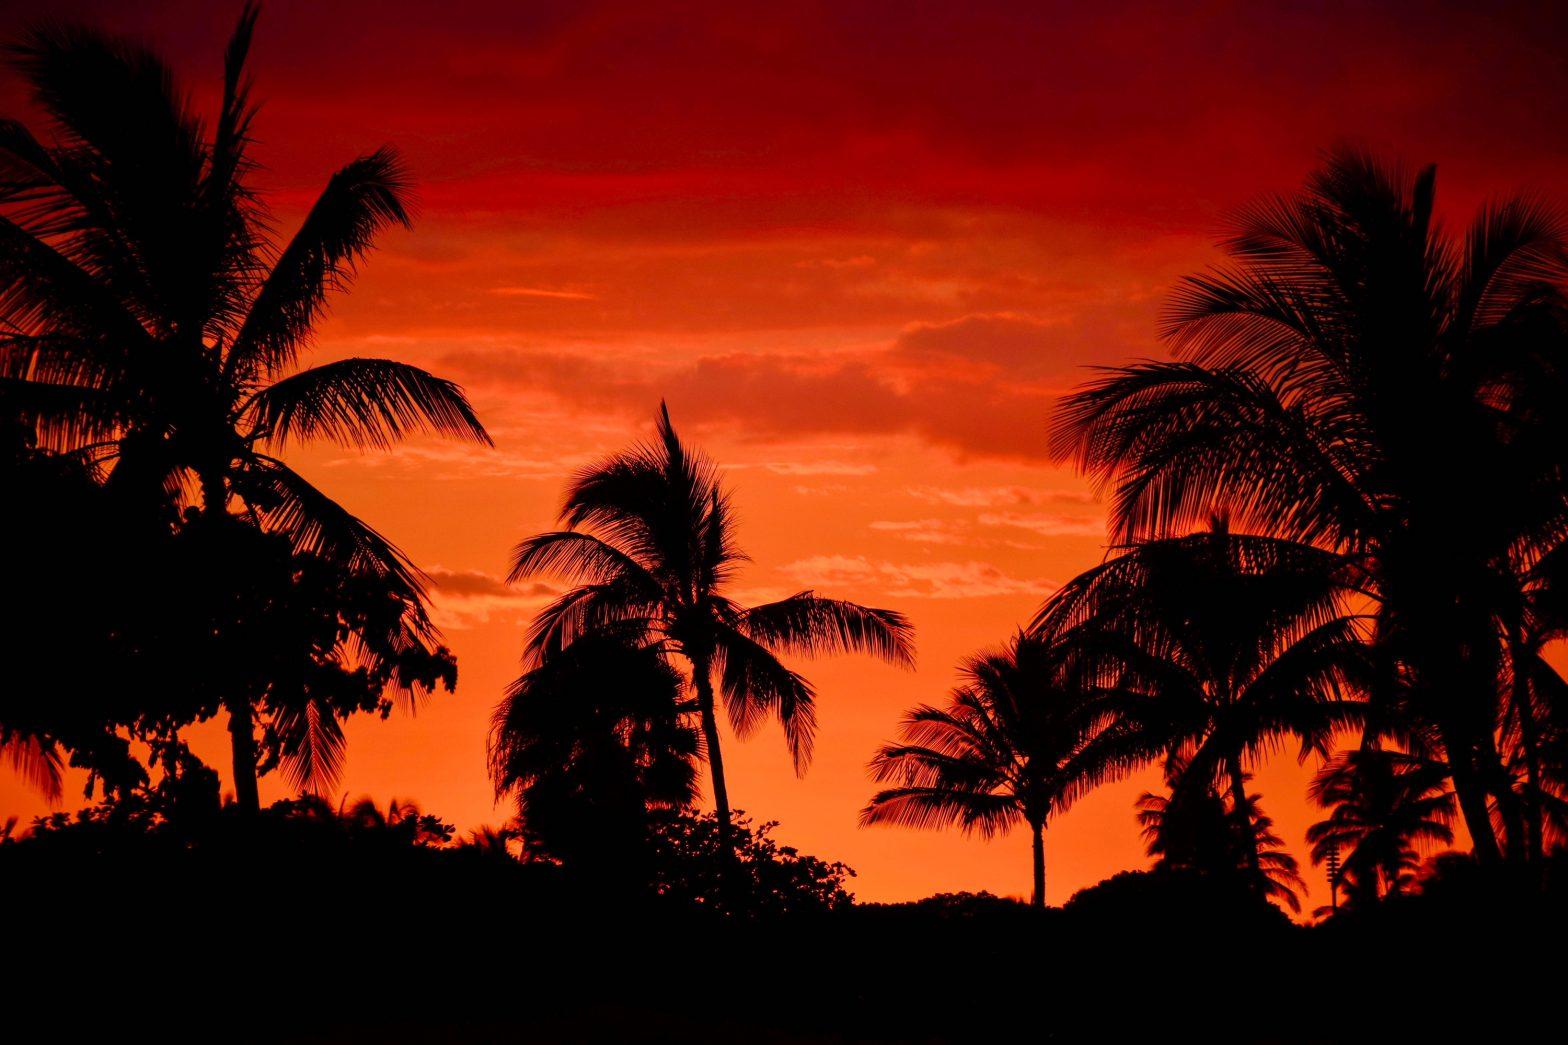 Hurricane Lane spared West Hawaii